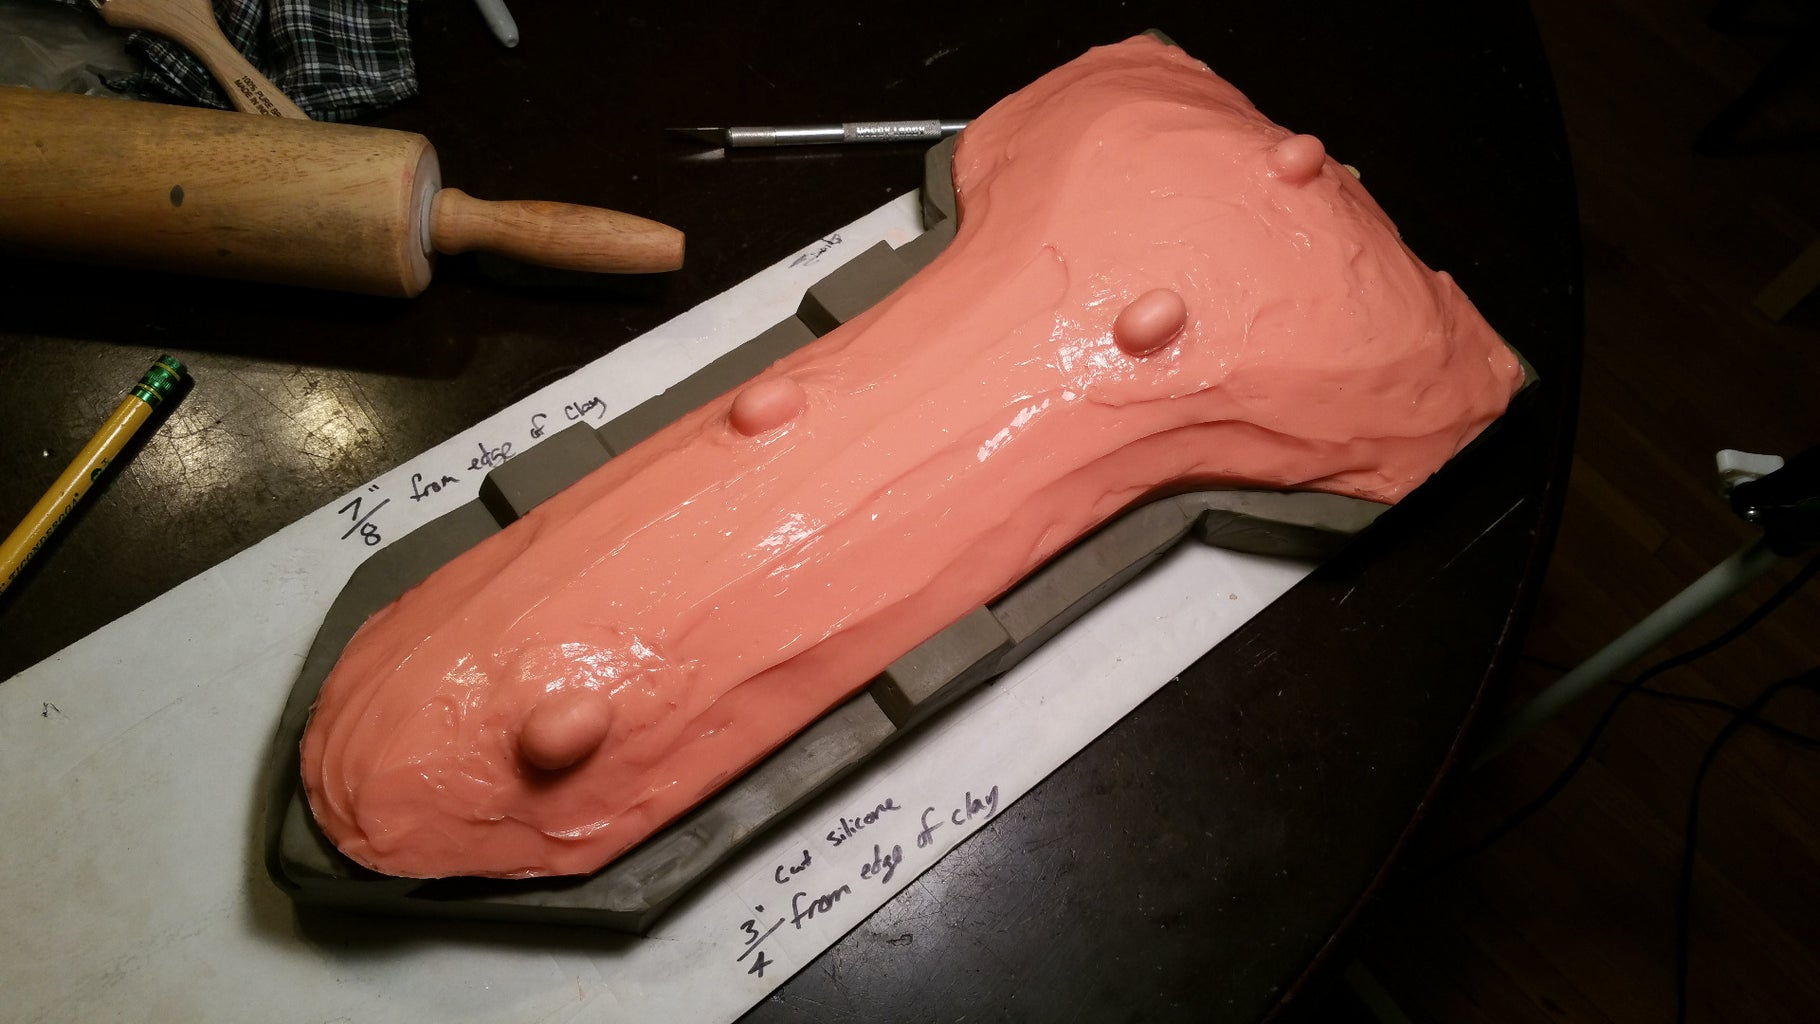 Dagger Body Mold & Mold Jacket